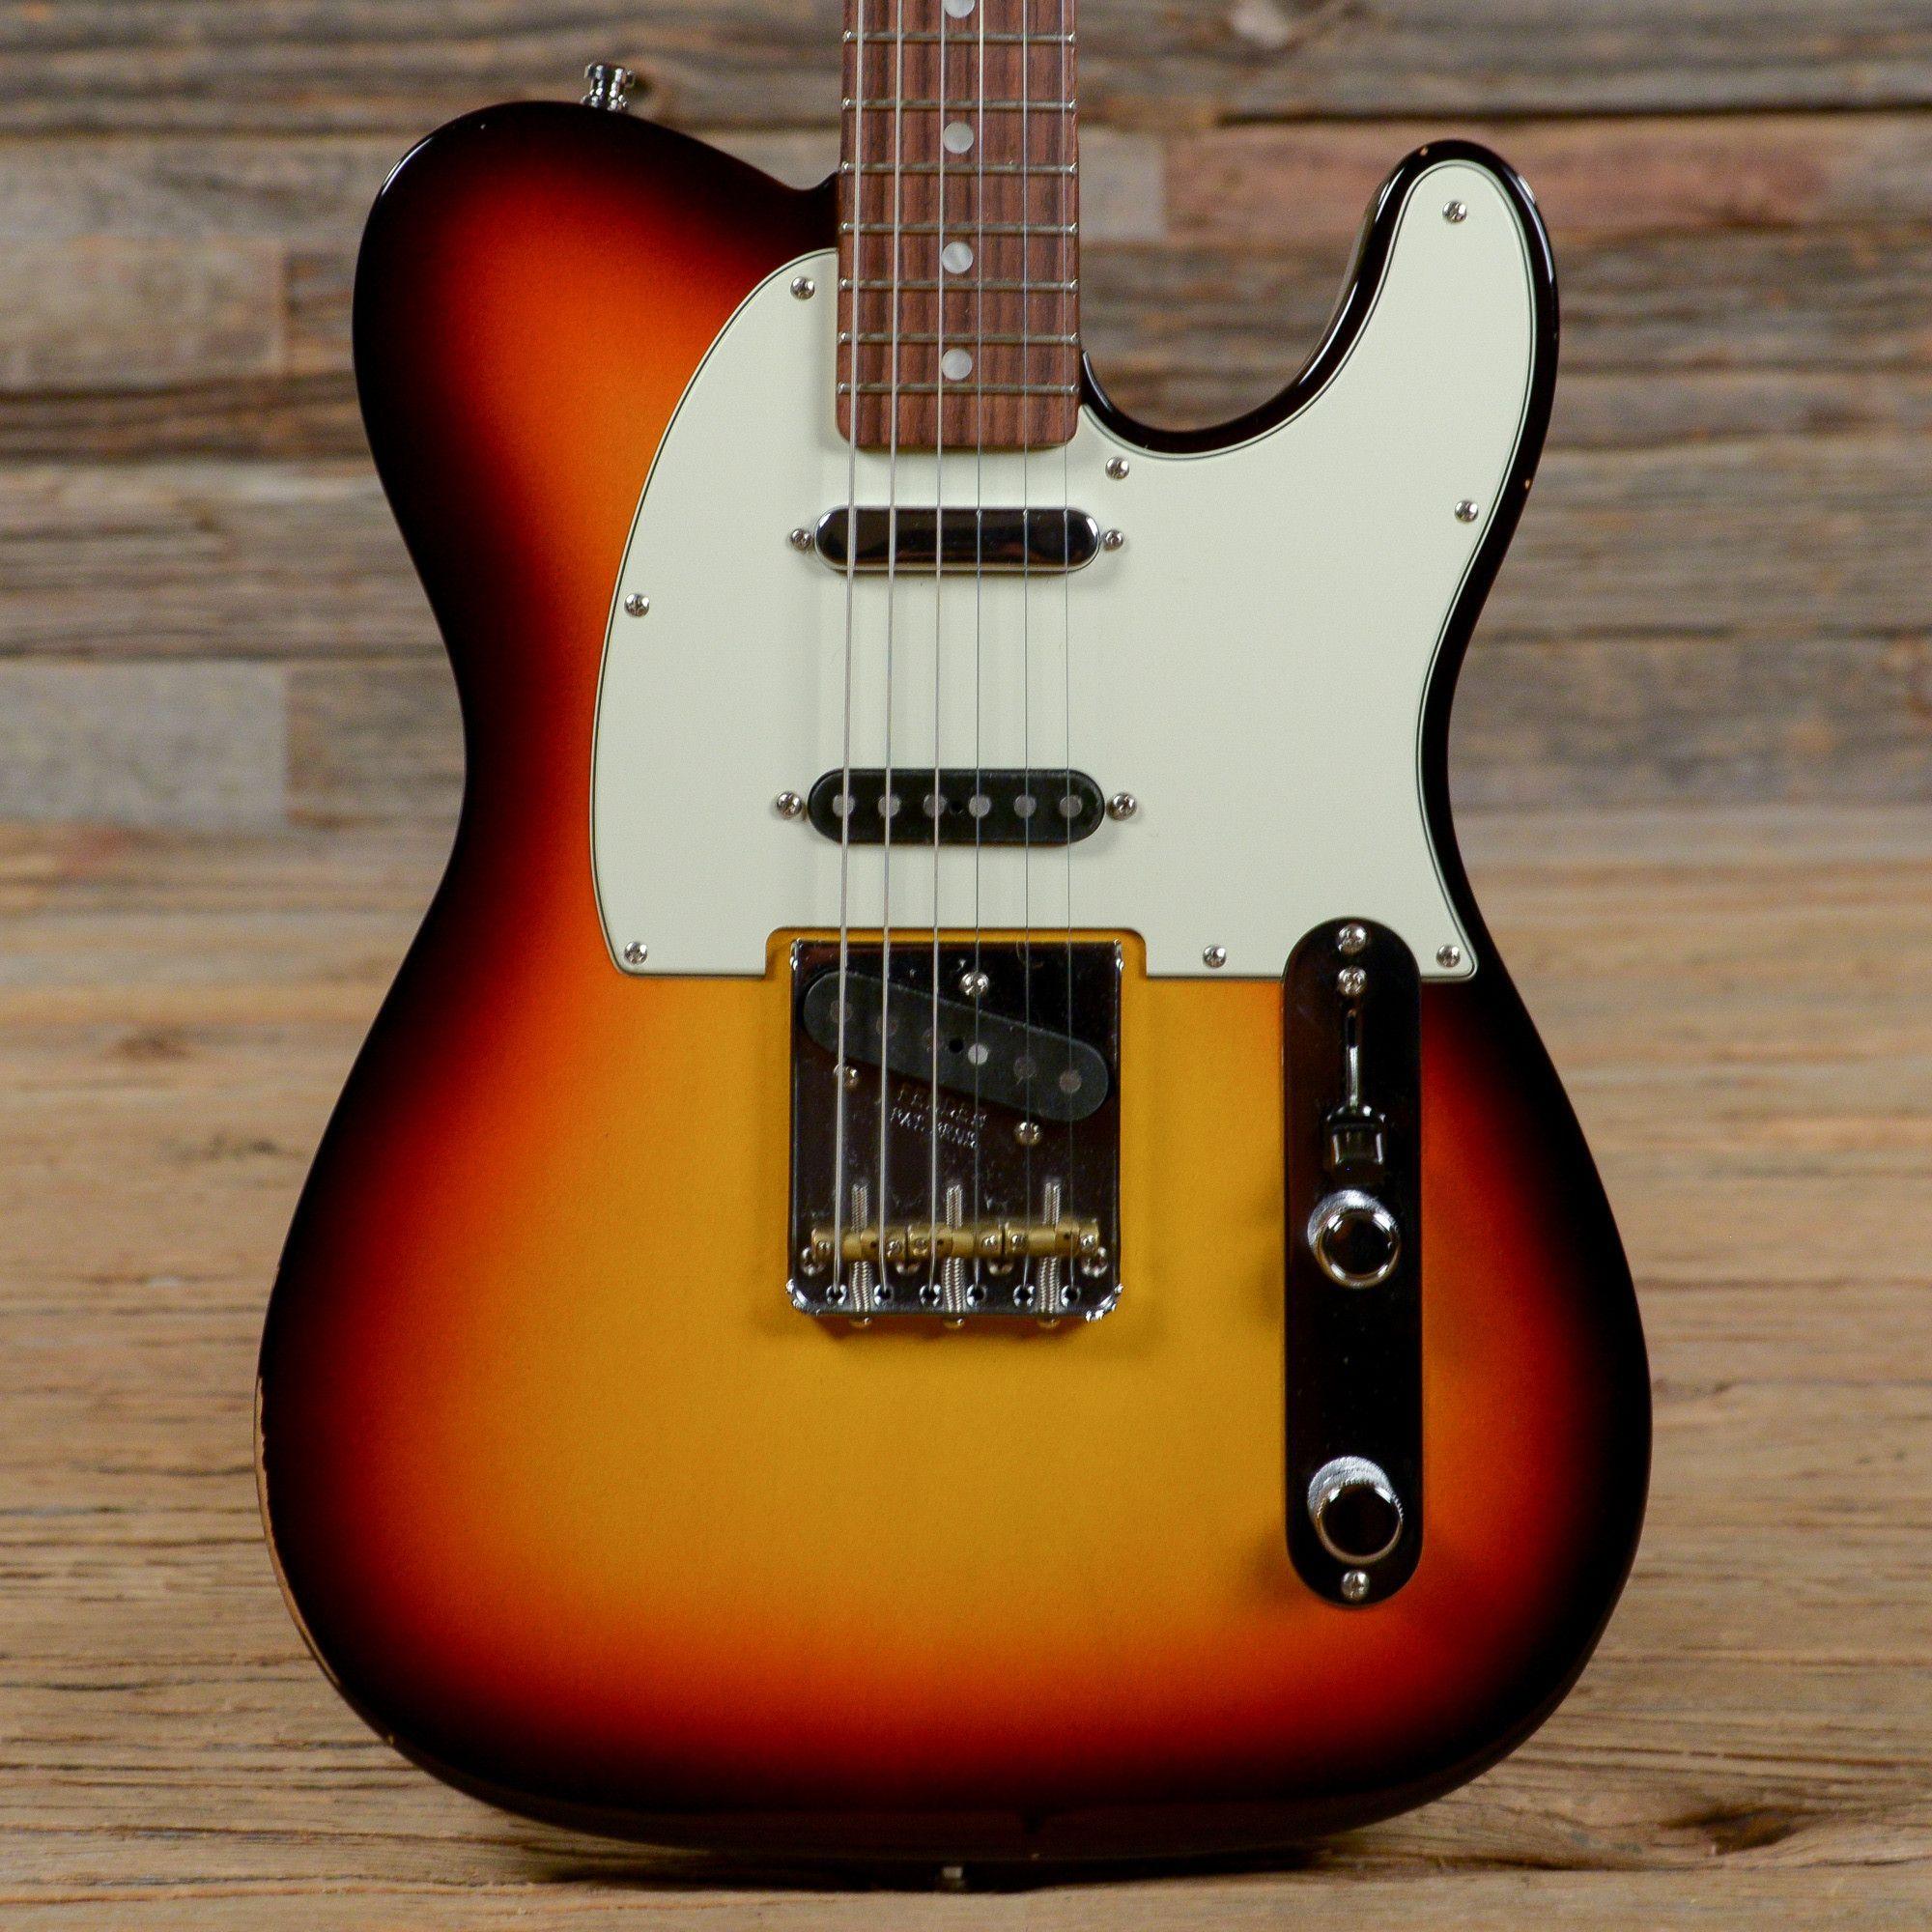 Fender American Vintage Hot Rod 60s Telecaster Sunburst USED s929